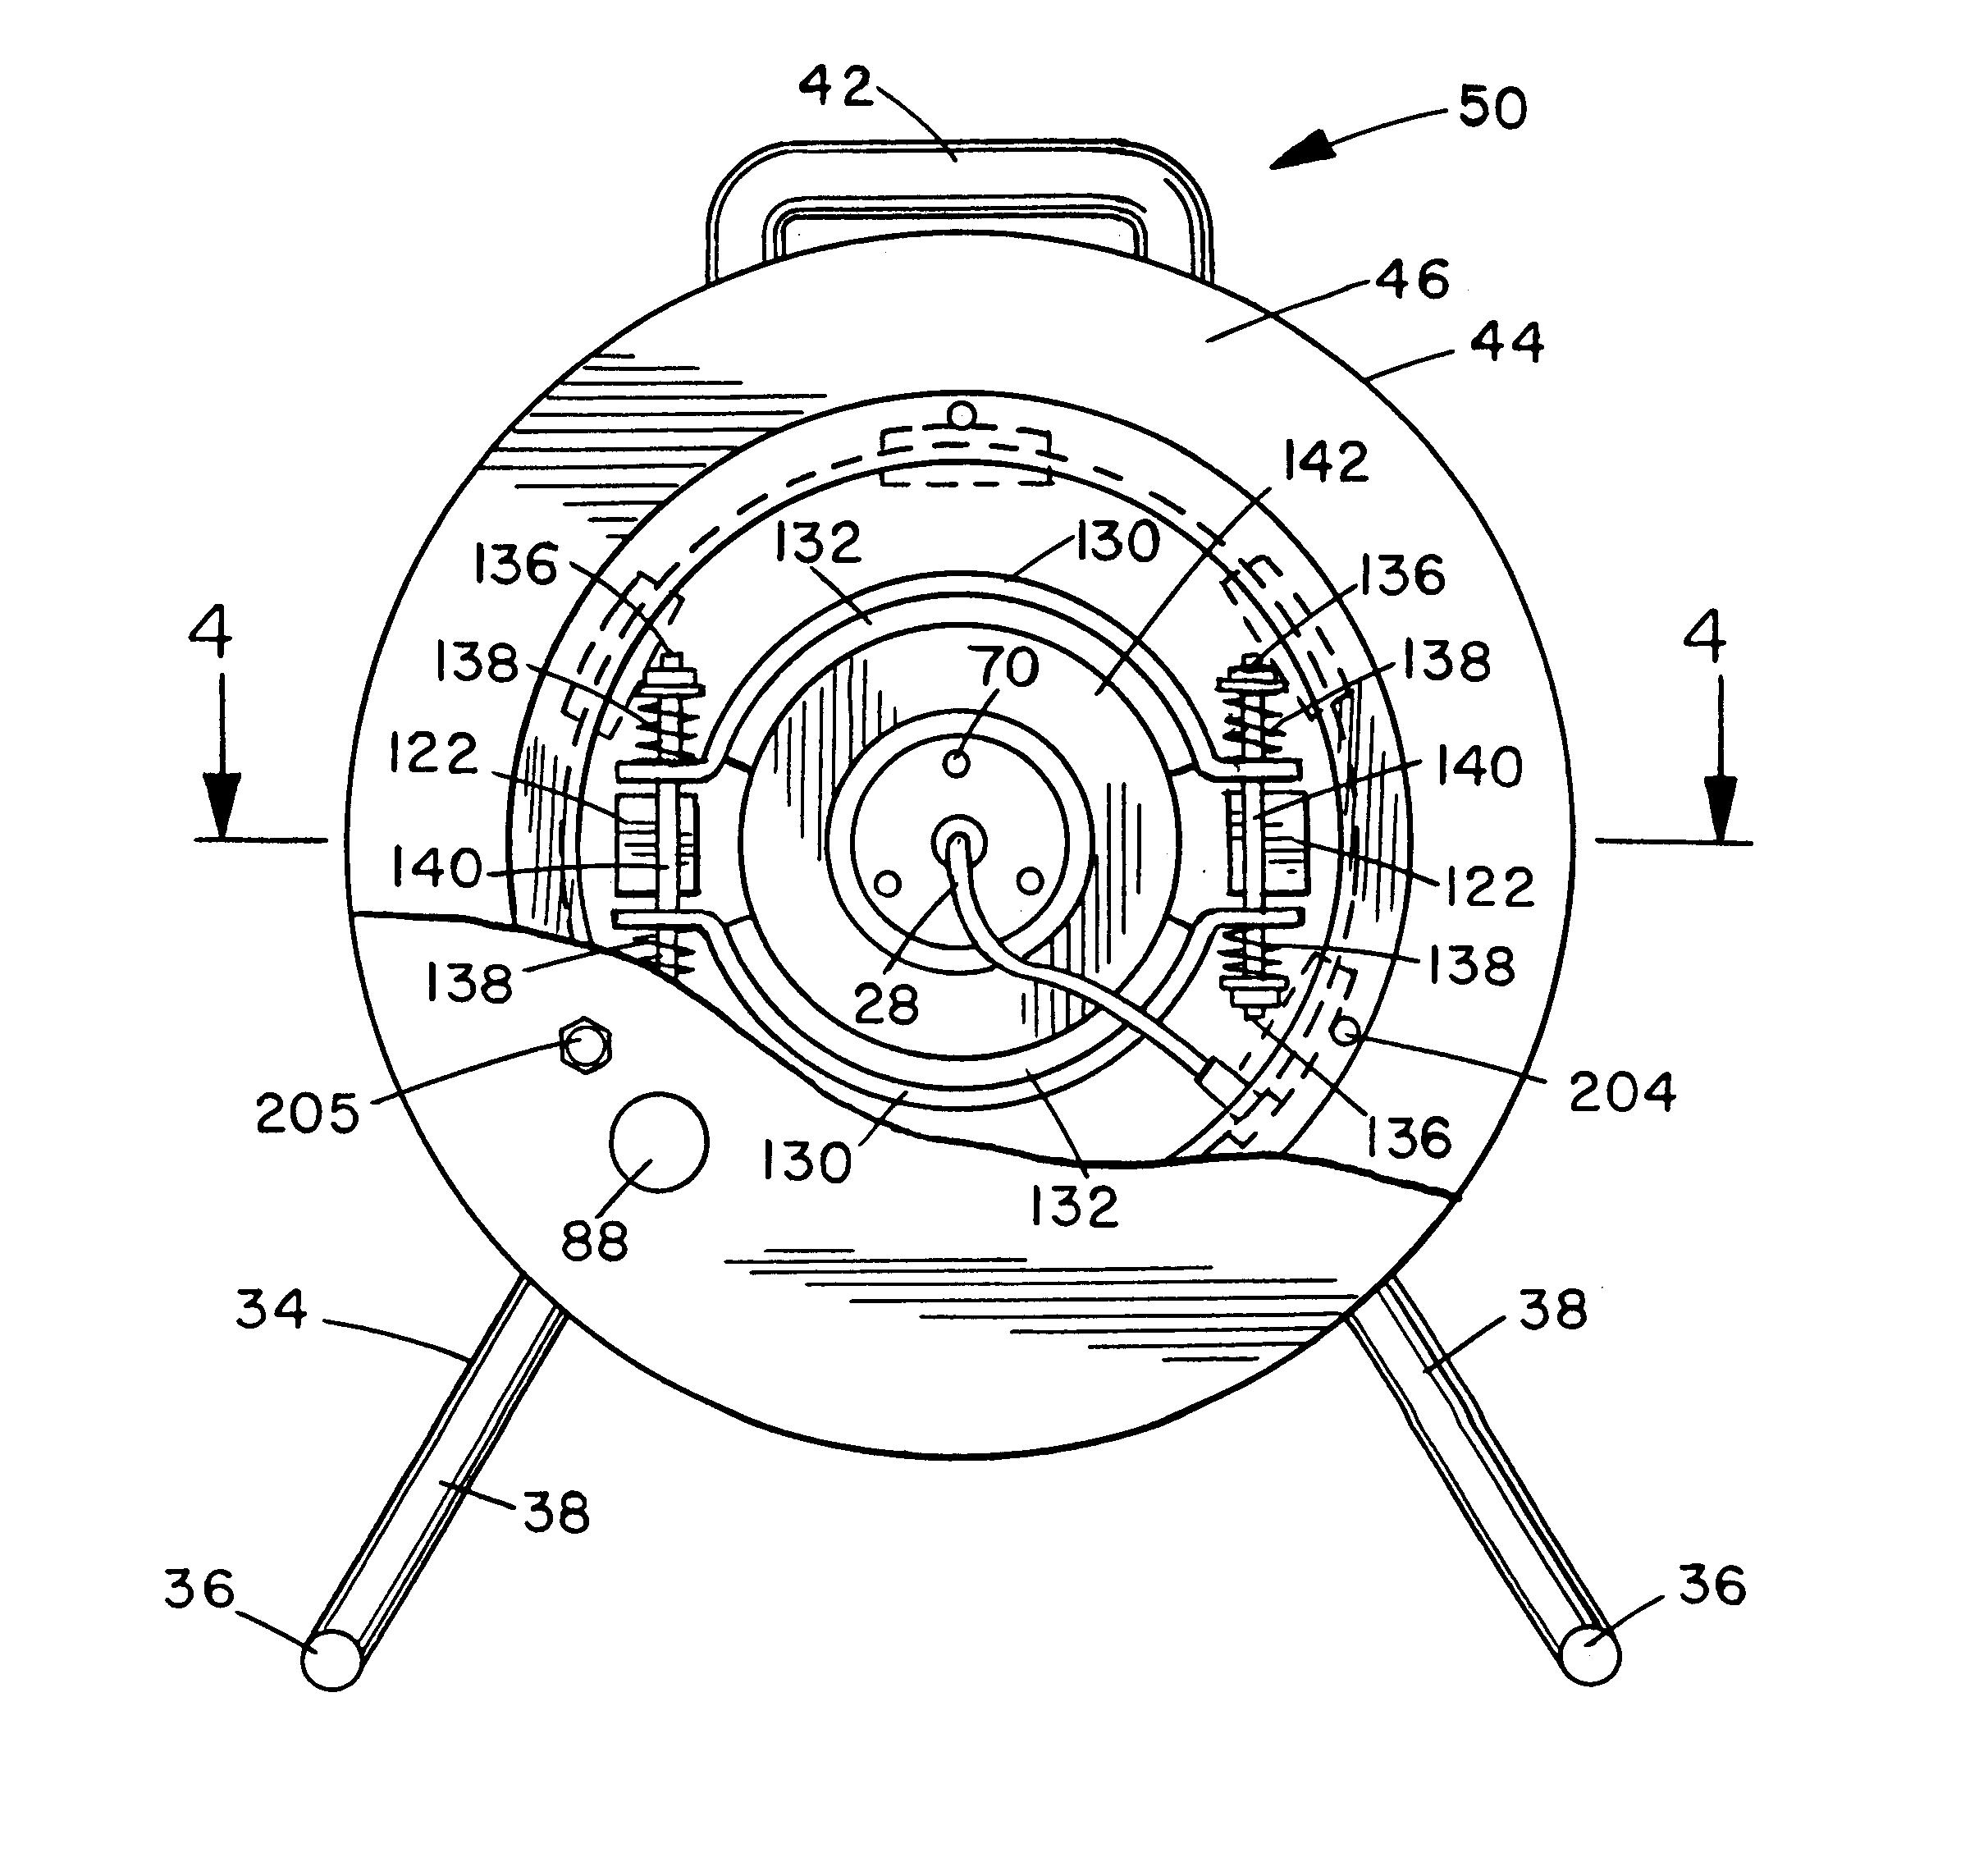 Headphone Jack Wiring Diagram For Aircraft Headphone